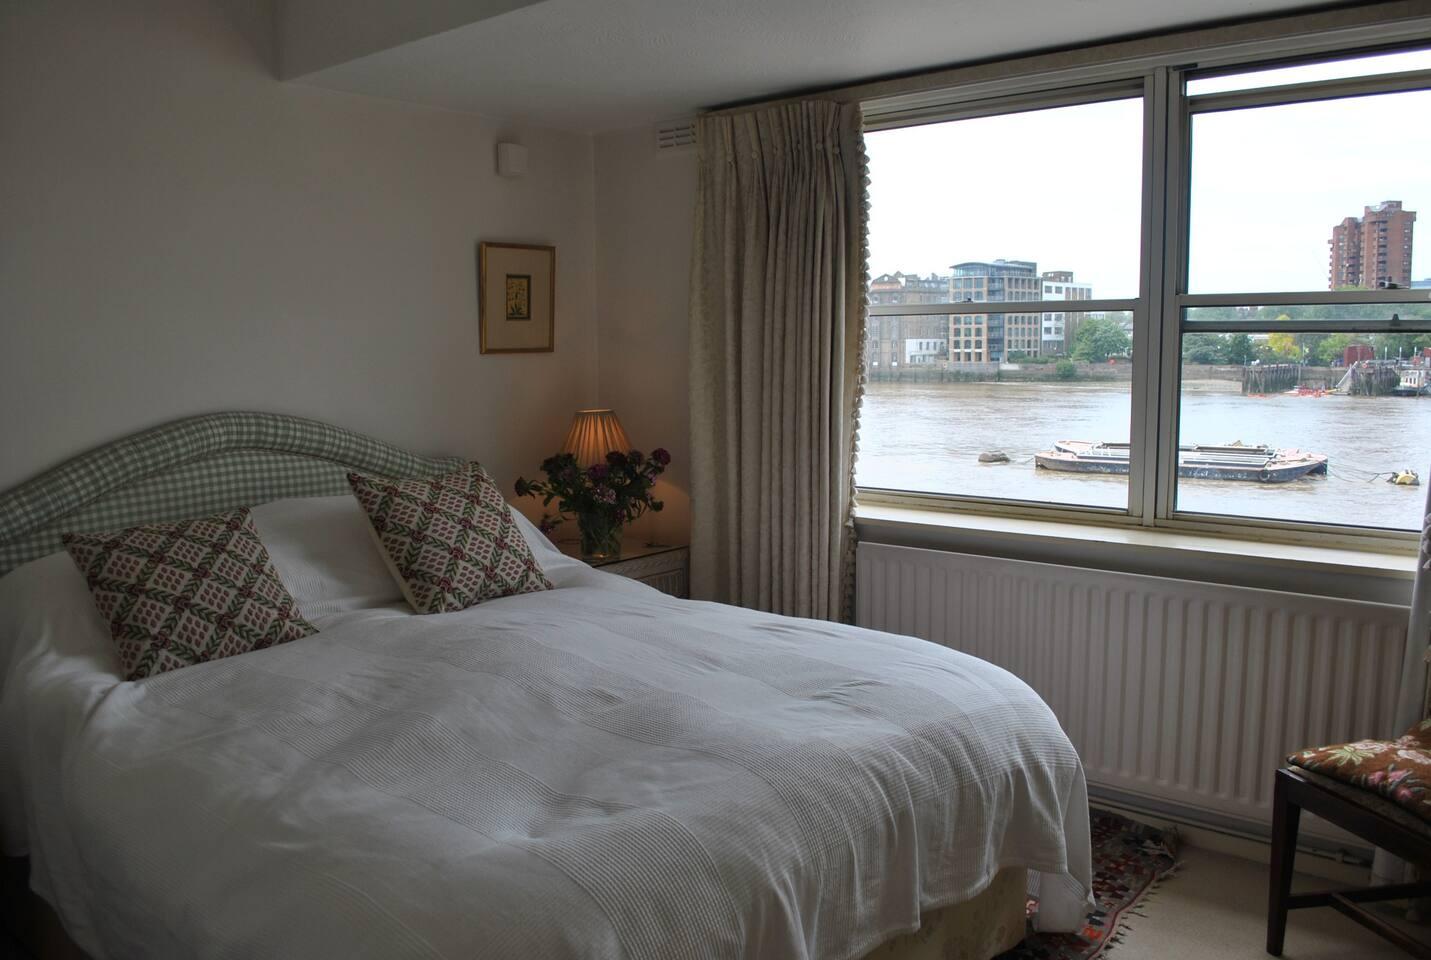 Wonderful views across the river Thames